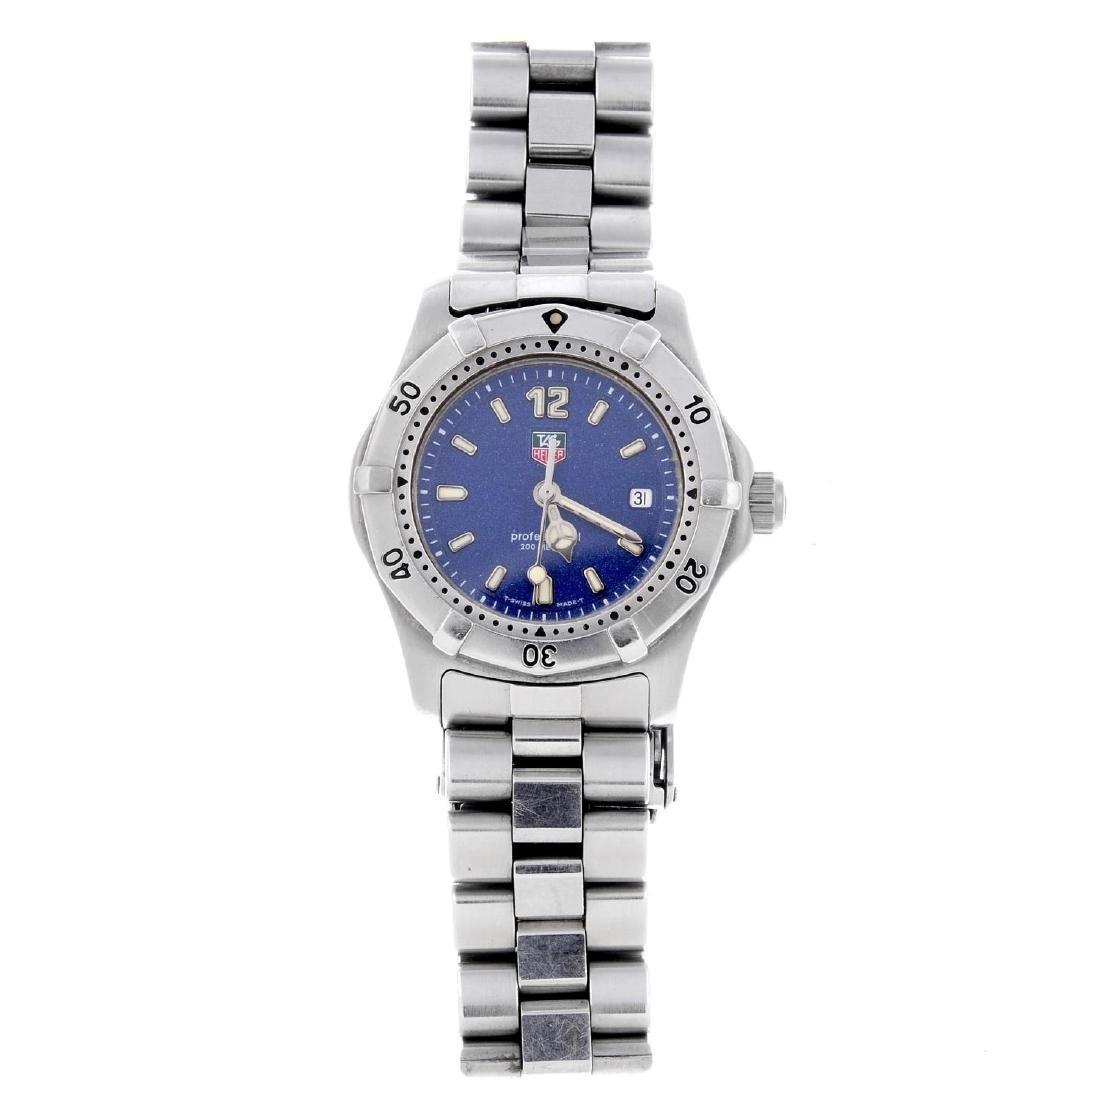 TAG HEUER - a lady's 2000 Series bracelet watch.